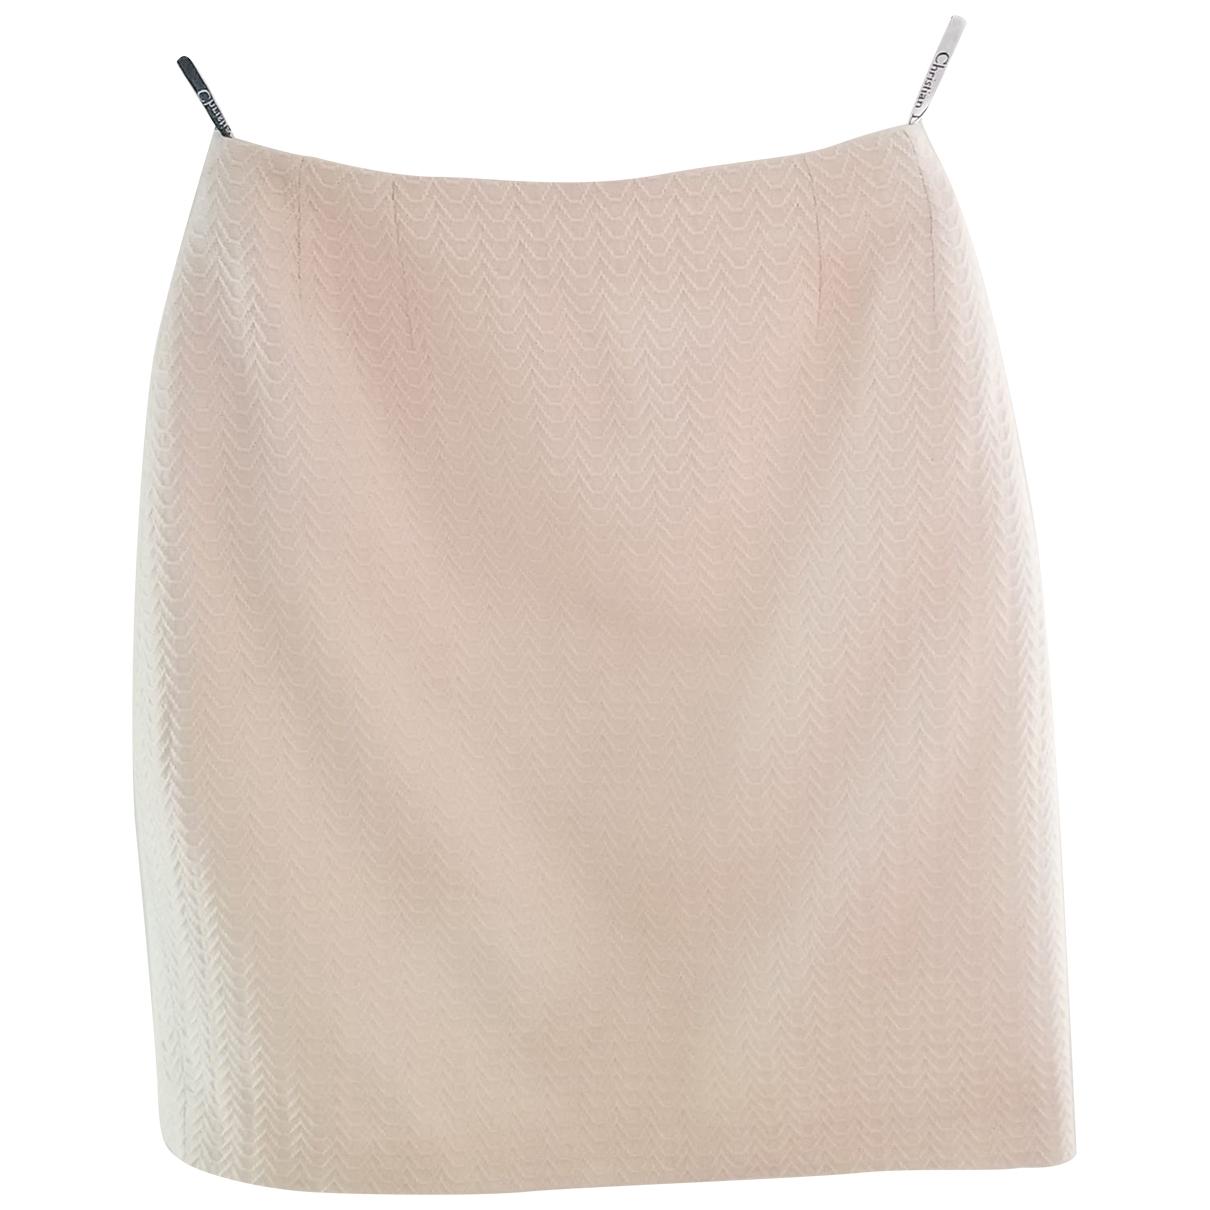 Dior \N Ecru Wool skirt for Women 40 FR